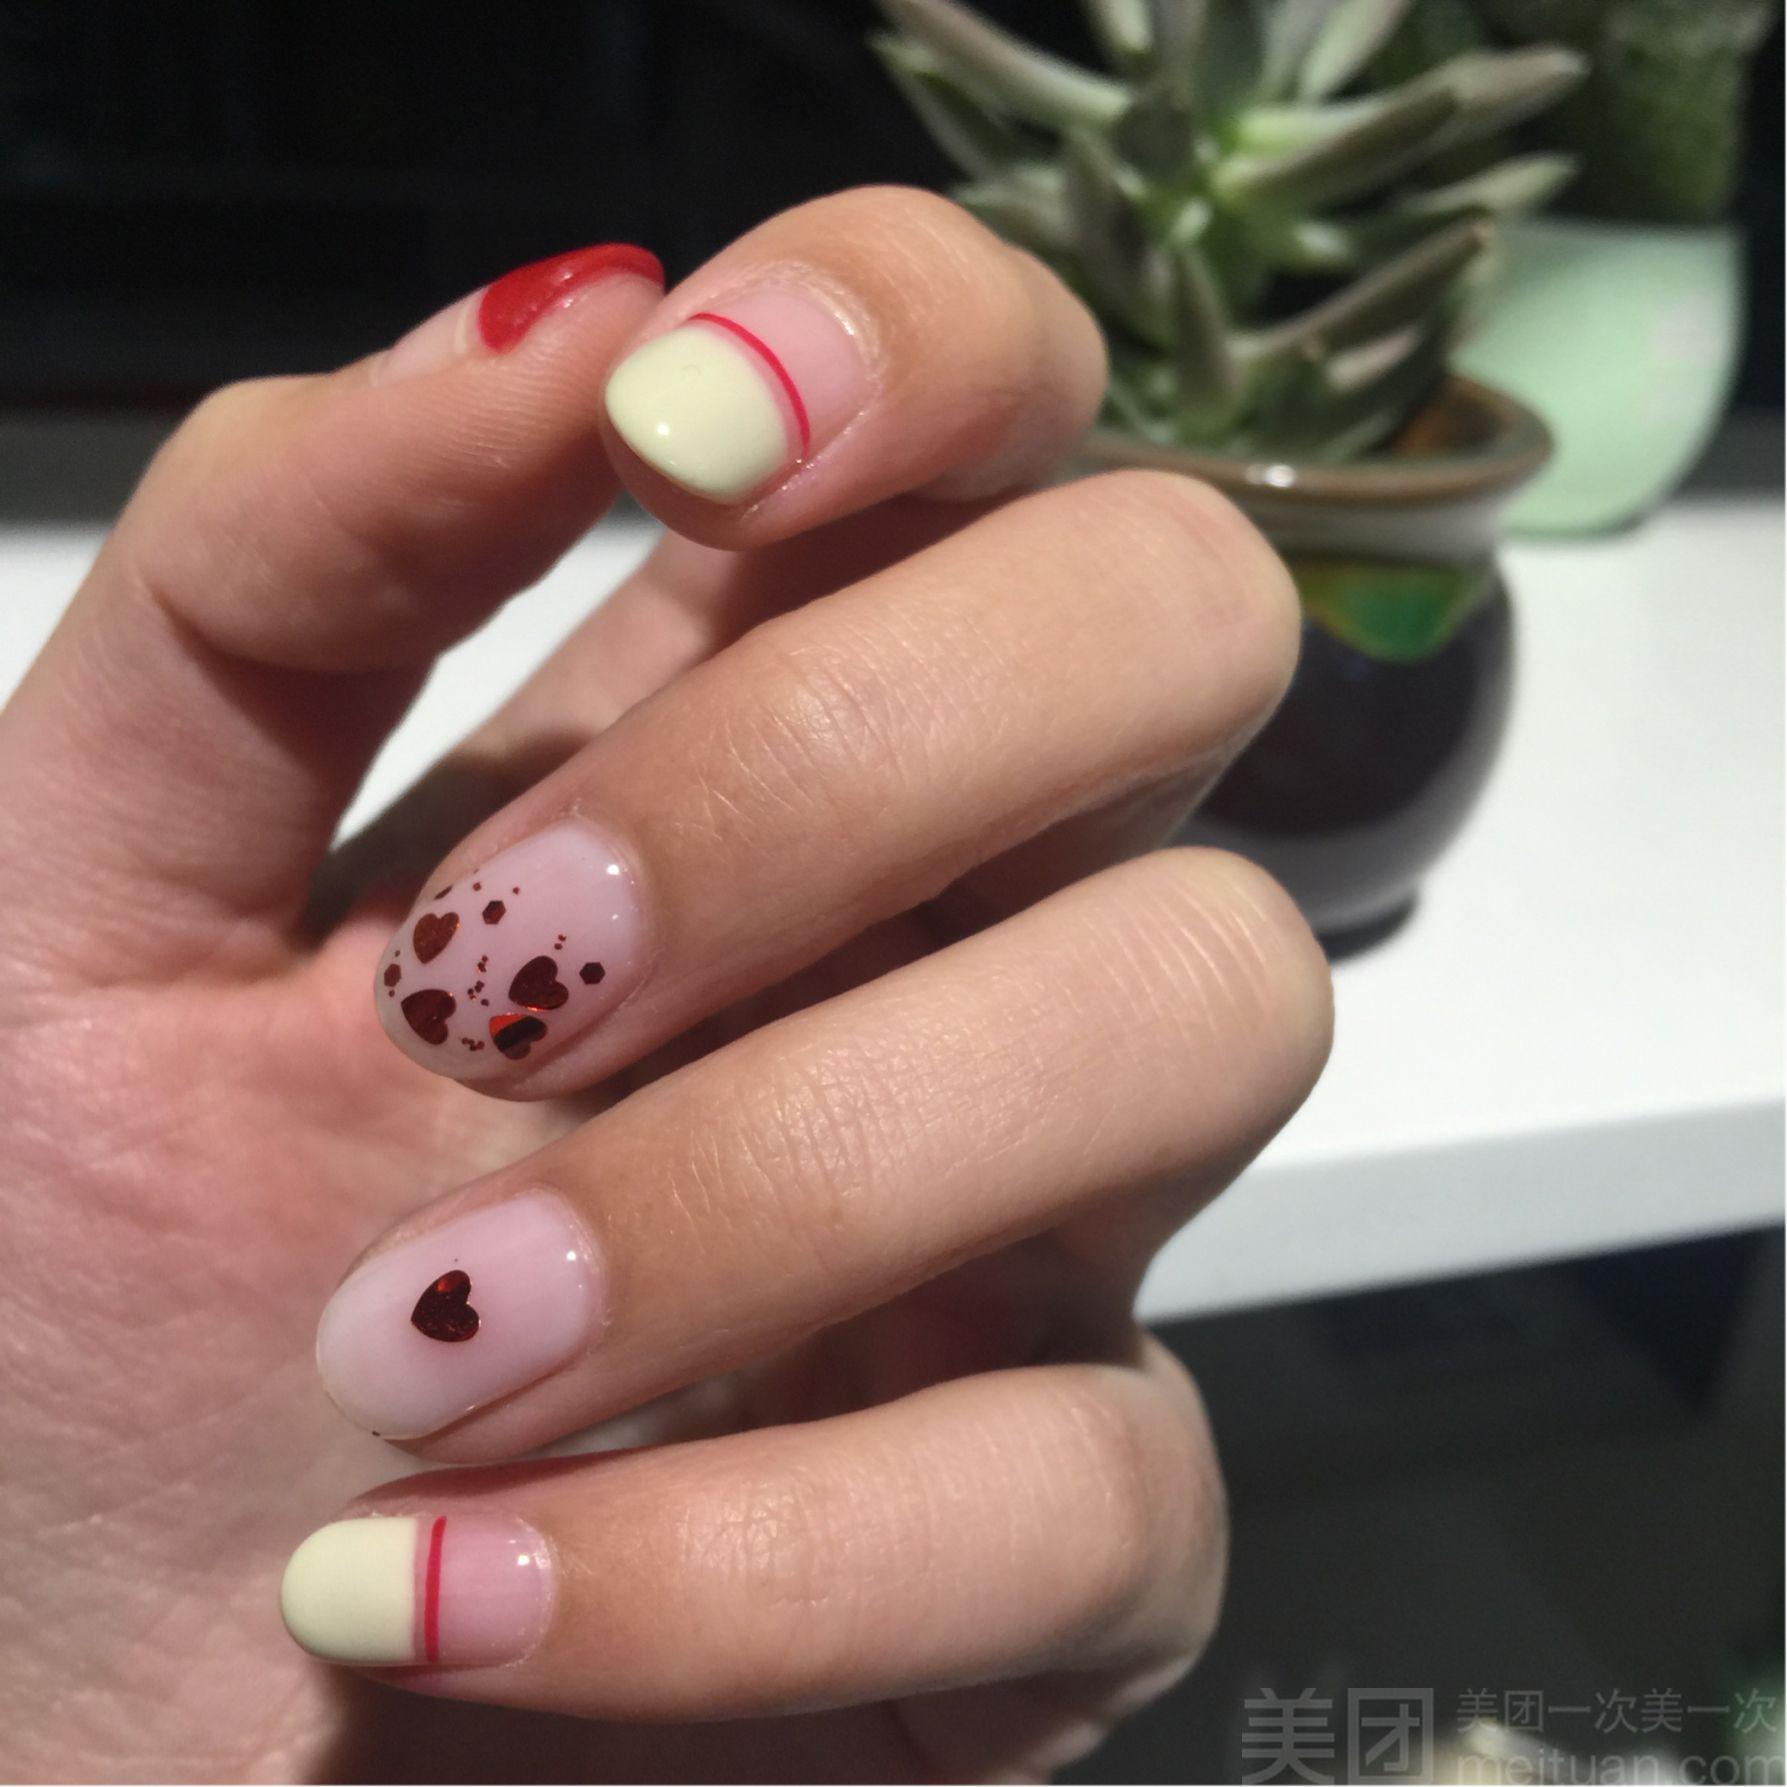 mickey nail-甲萌萌米奇主题美甲美睫馆